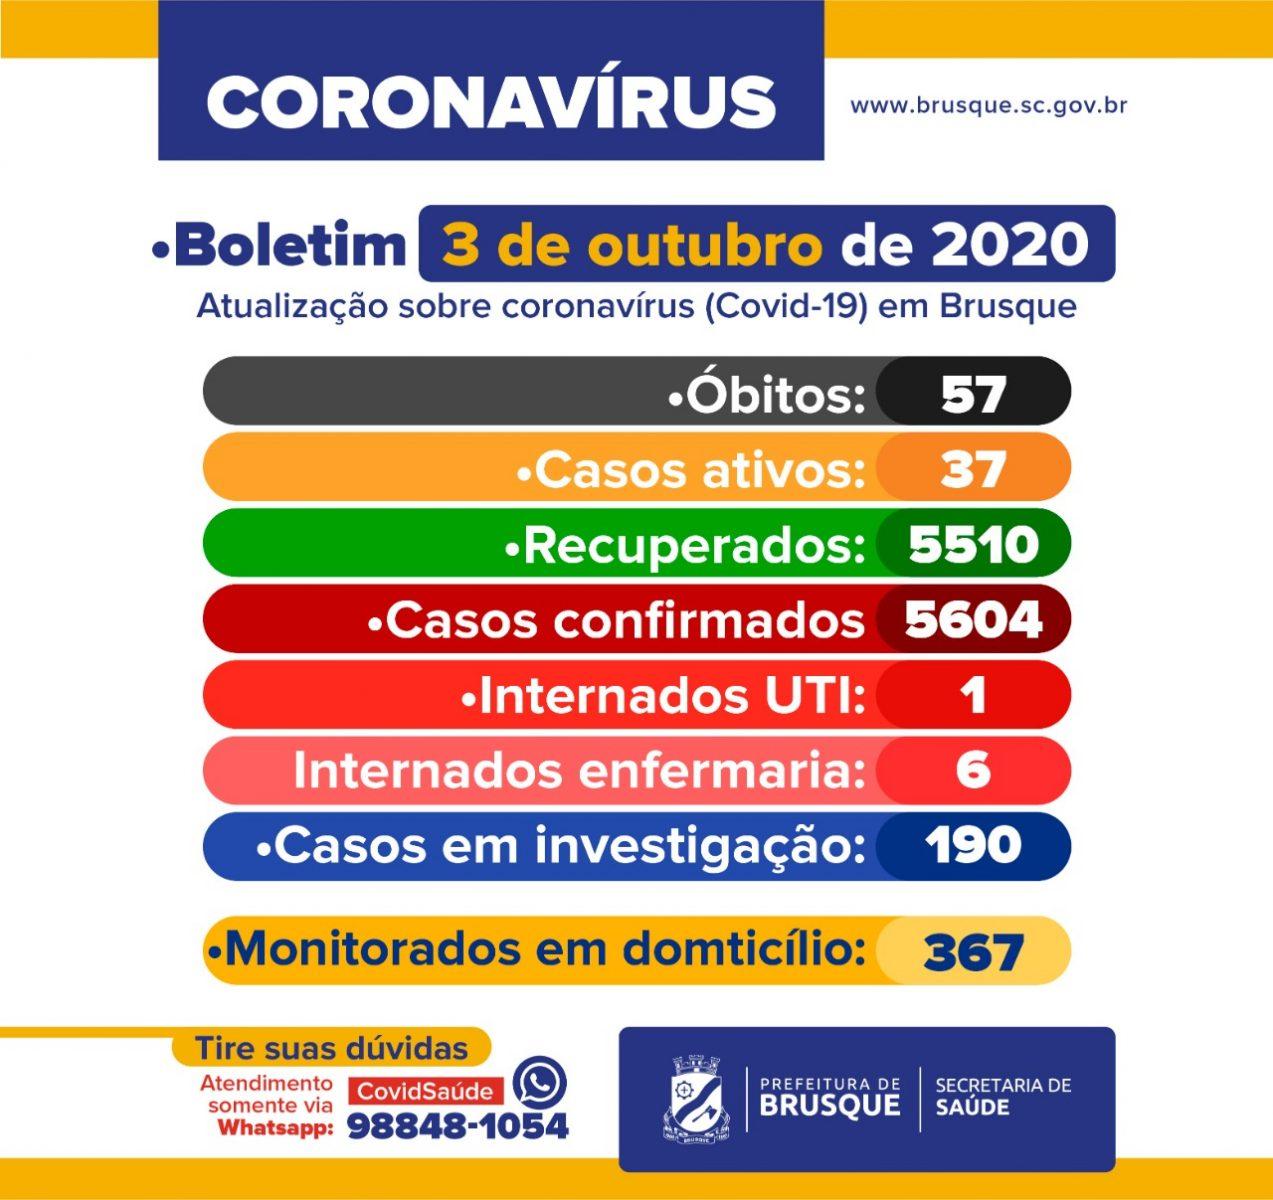 COVID-19: Boletim epidemiológico 3 de outubro